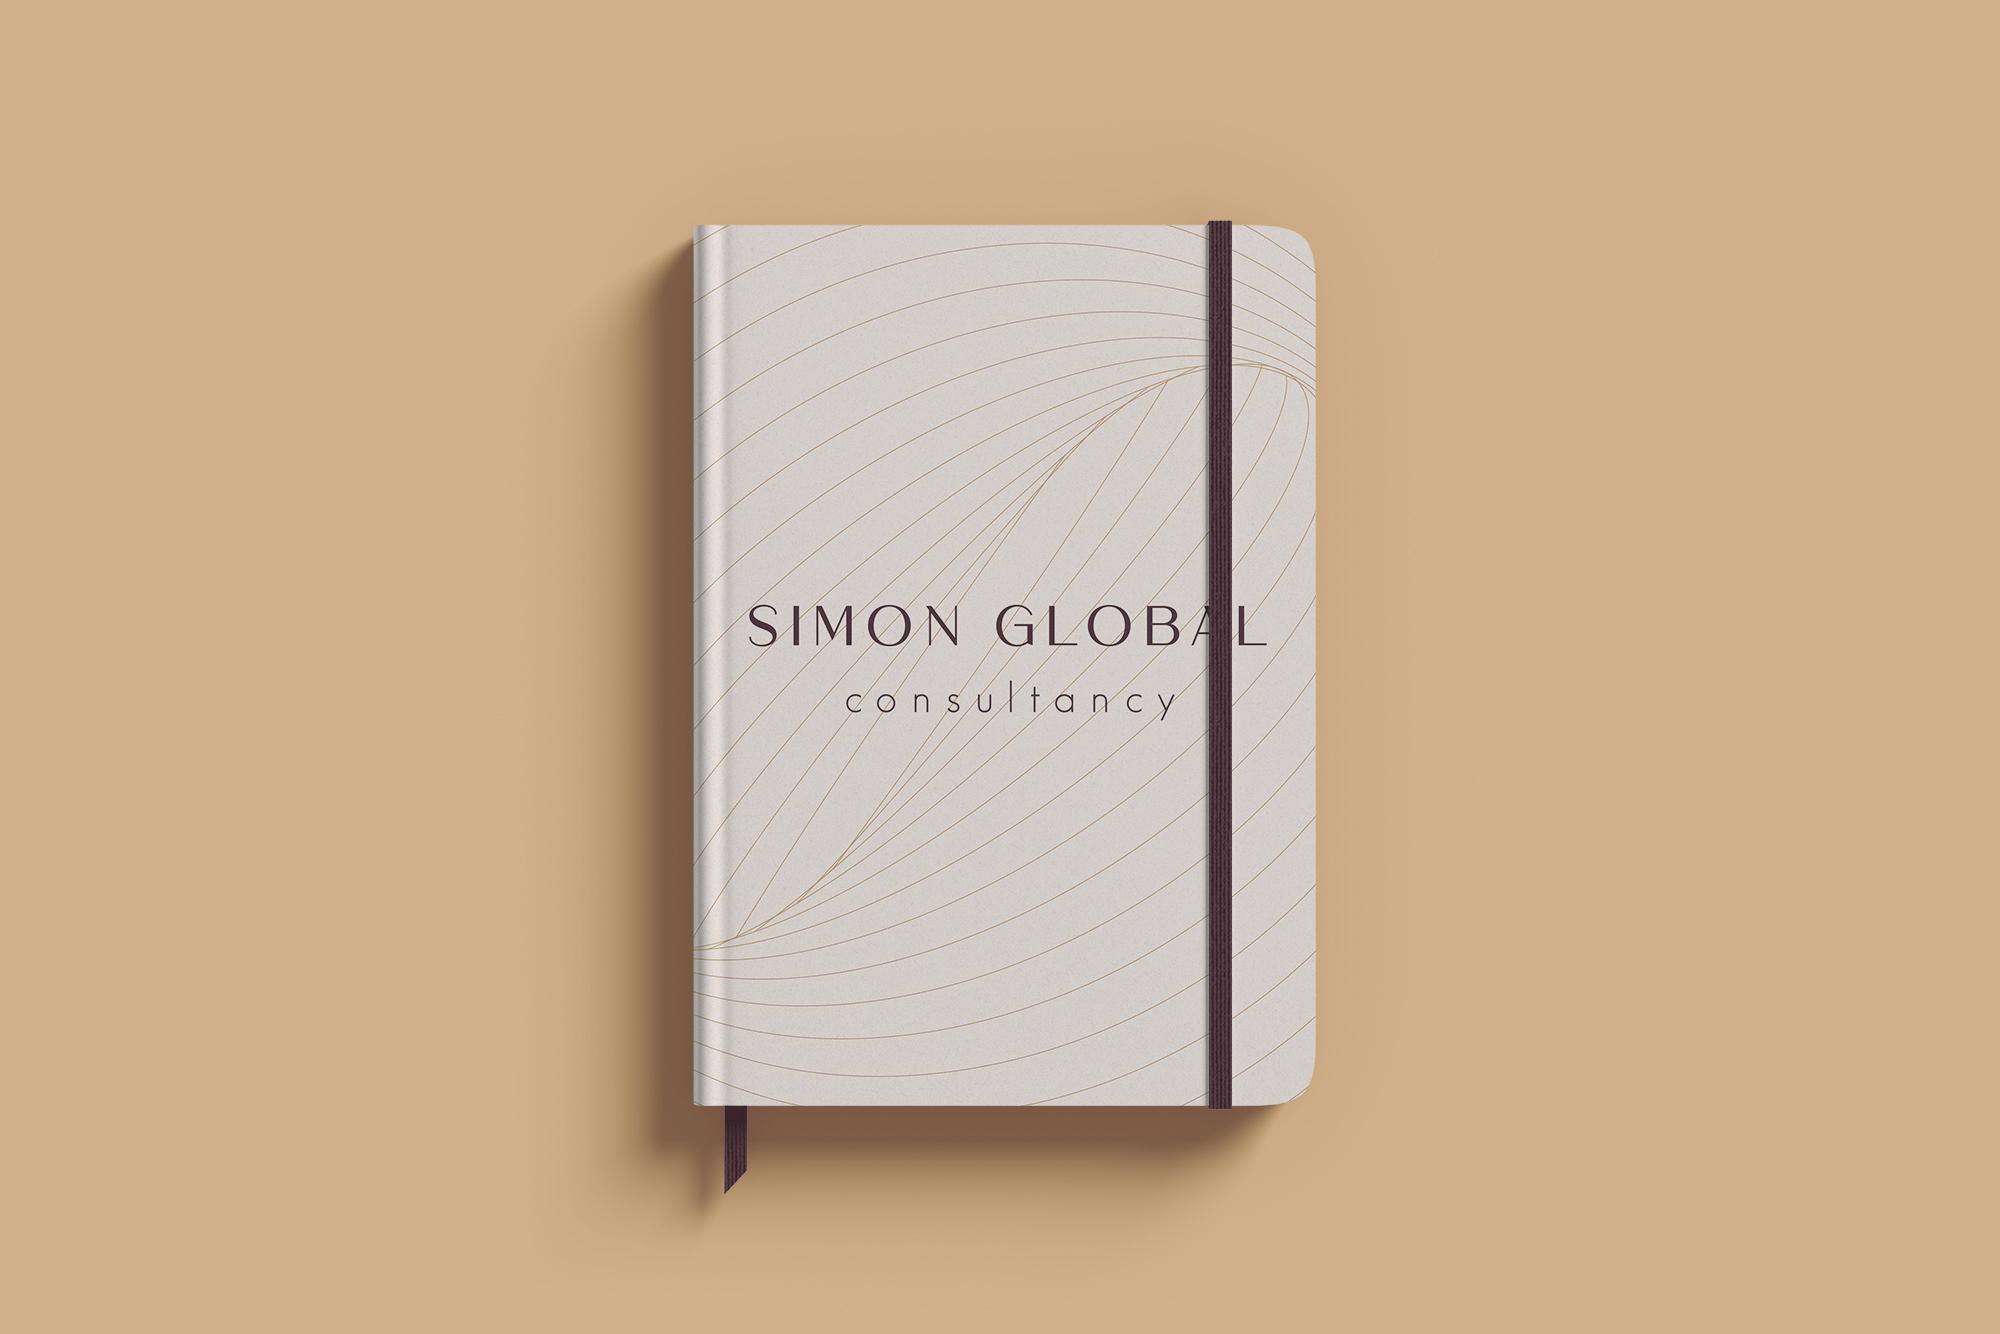 Simon Global Consultancy